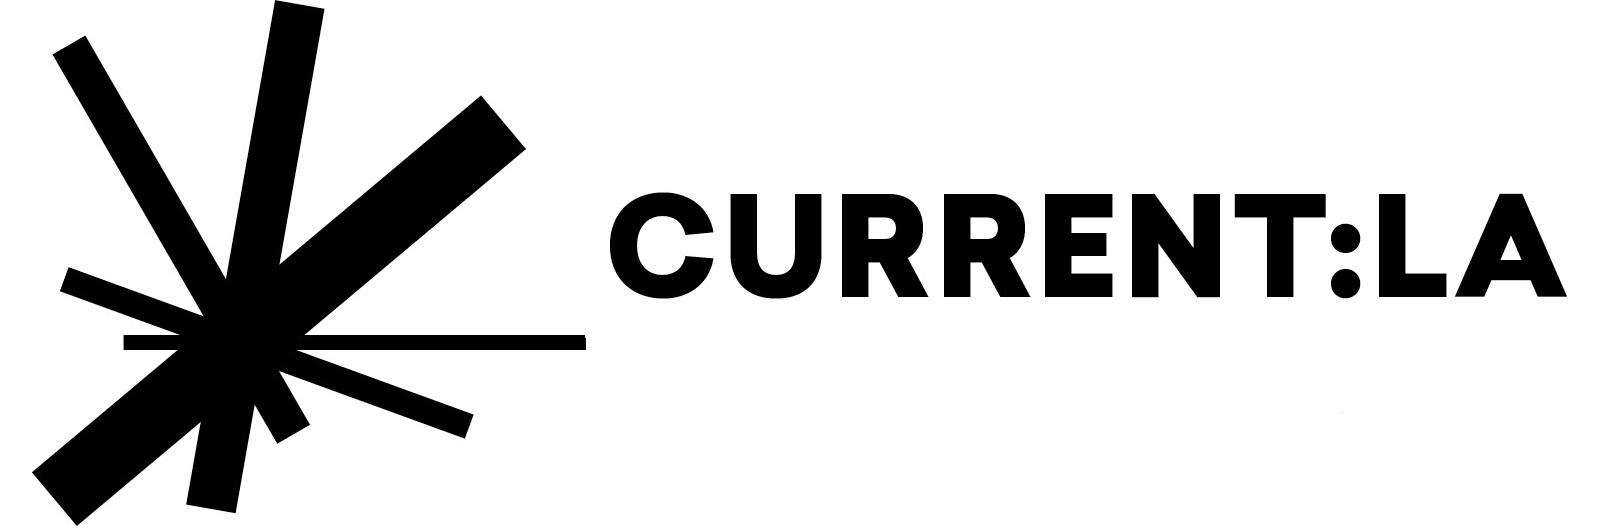 CURRENT-color-GENERAL.png